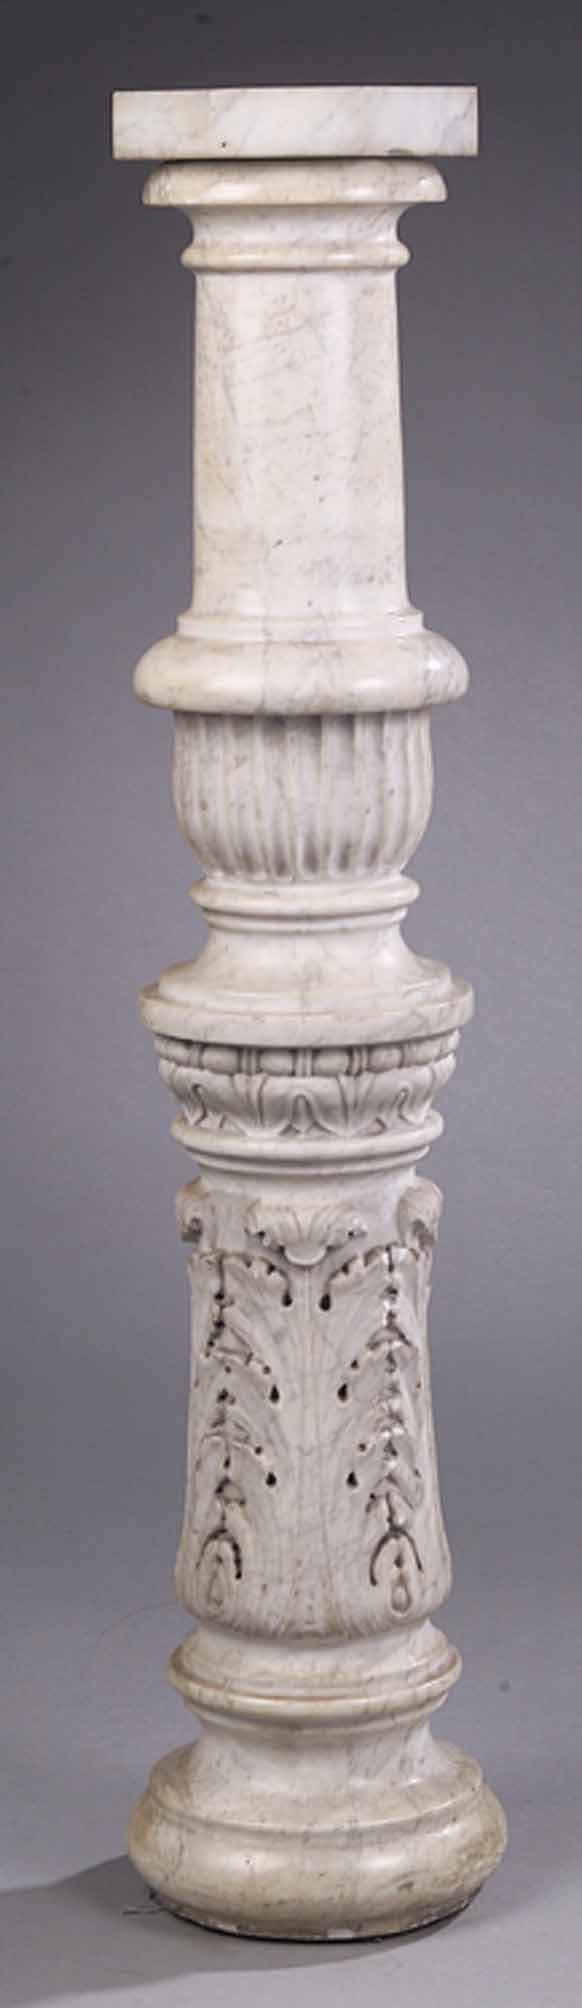 Late 19th c. White Marble Pedestal